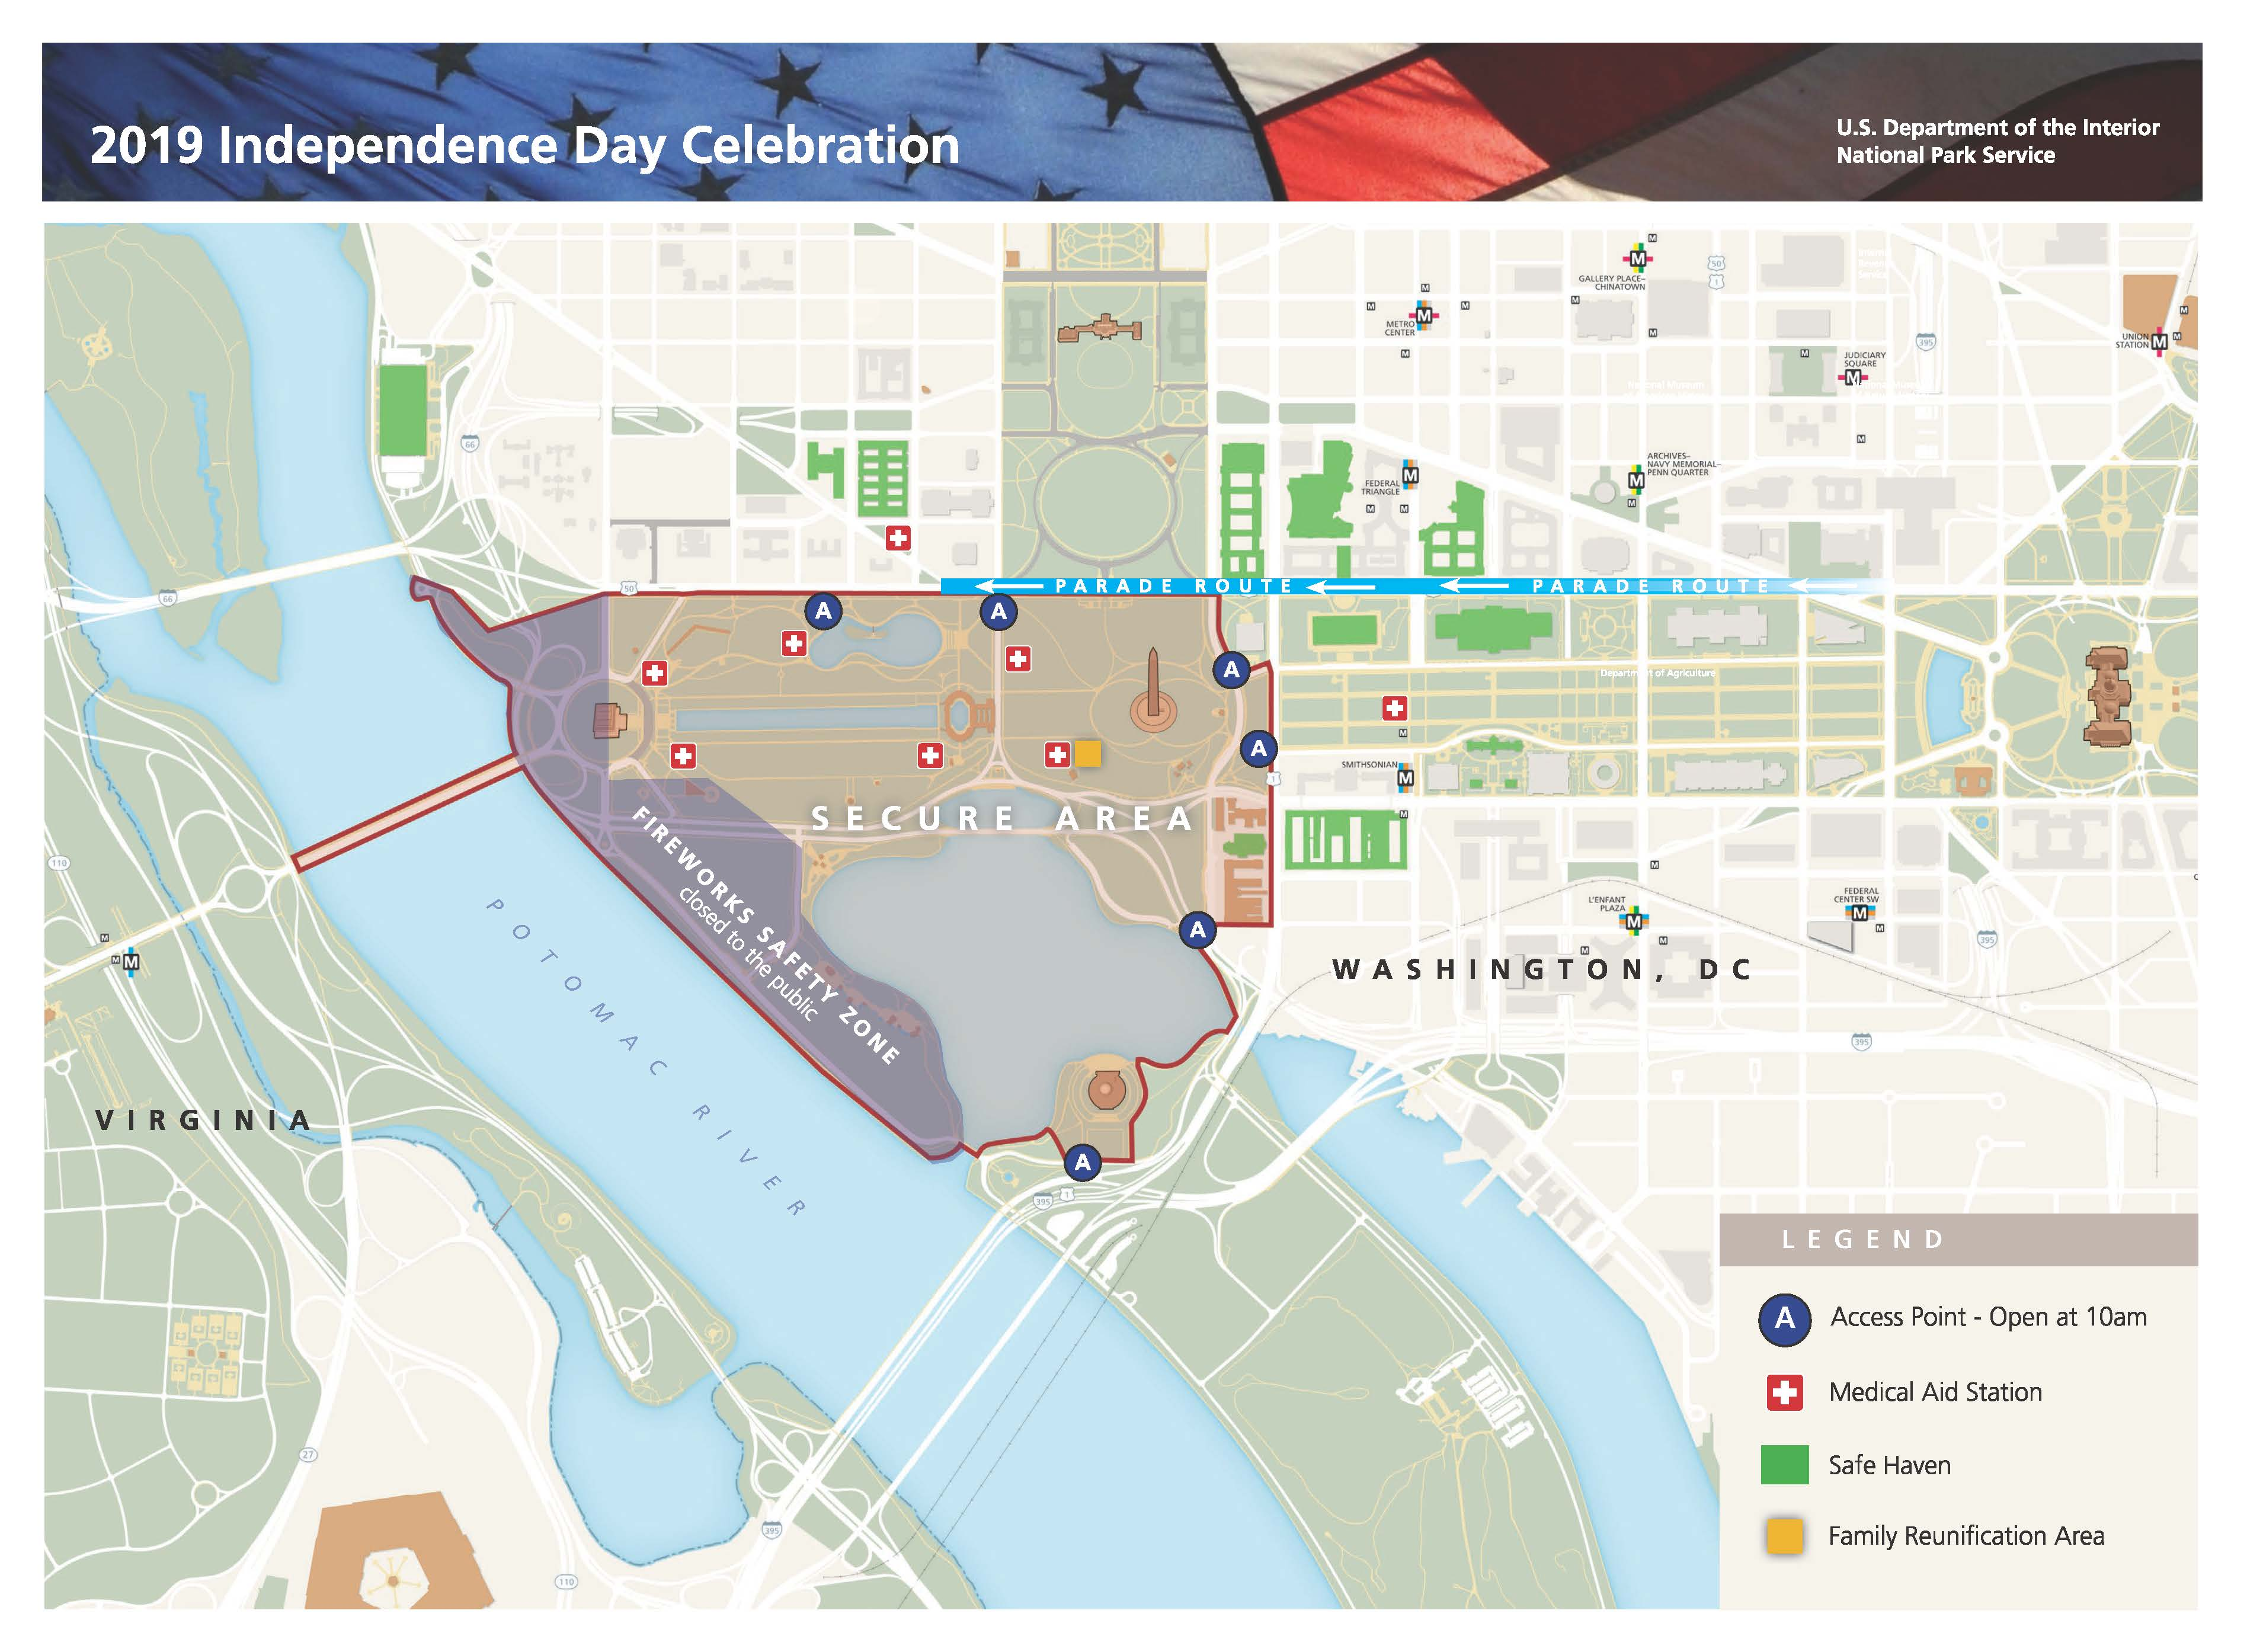 photo regarding Printable Map of Washington Dc Mall identified as Maps - Washington, DC, Fourth of July Social gathering (U.S.